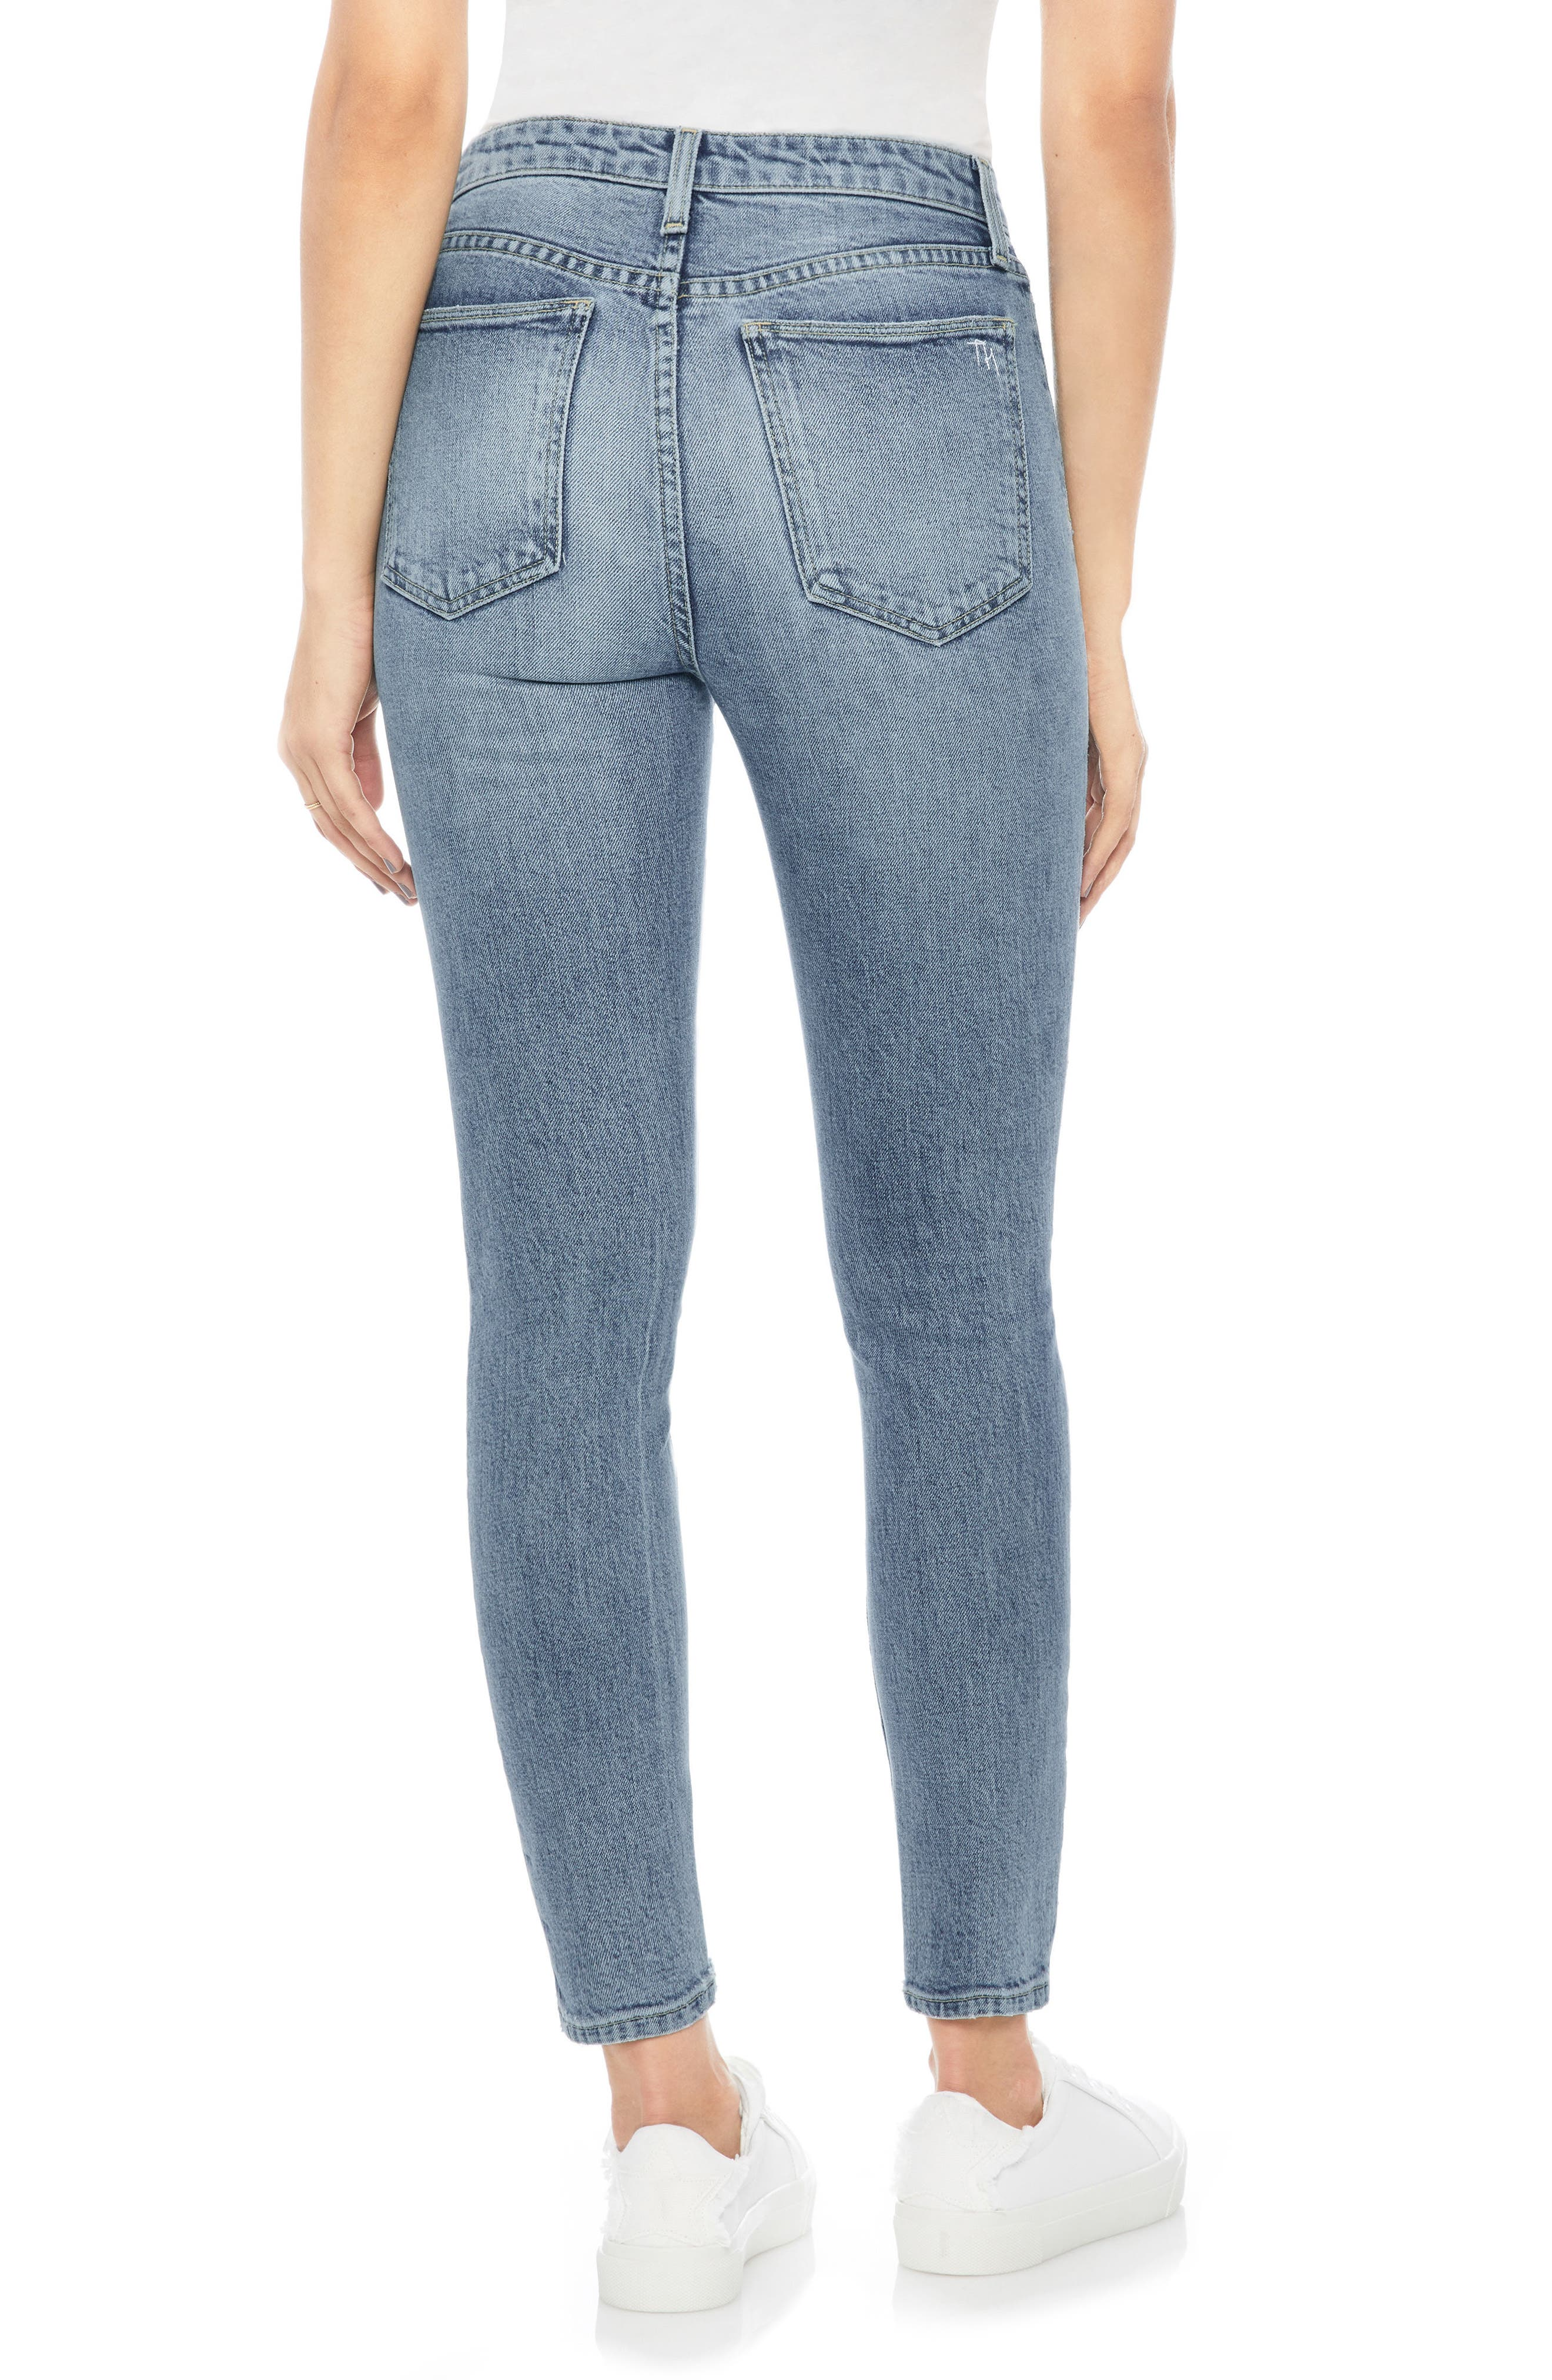 JOE'S,                             Charlie High Waist Ankle Skinny Jeans,                             Alternate thumbnail 2, color,                             415